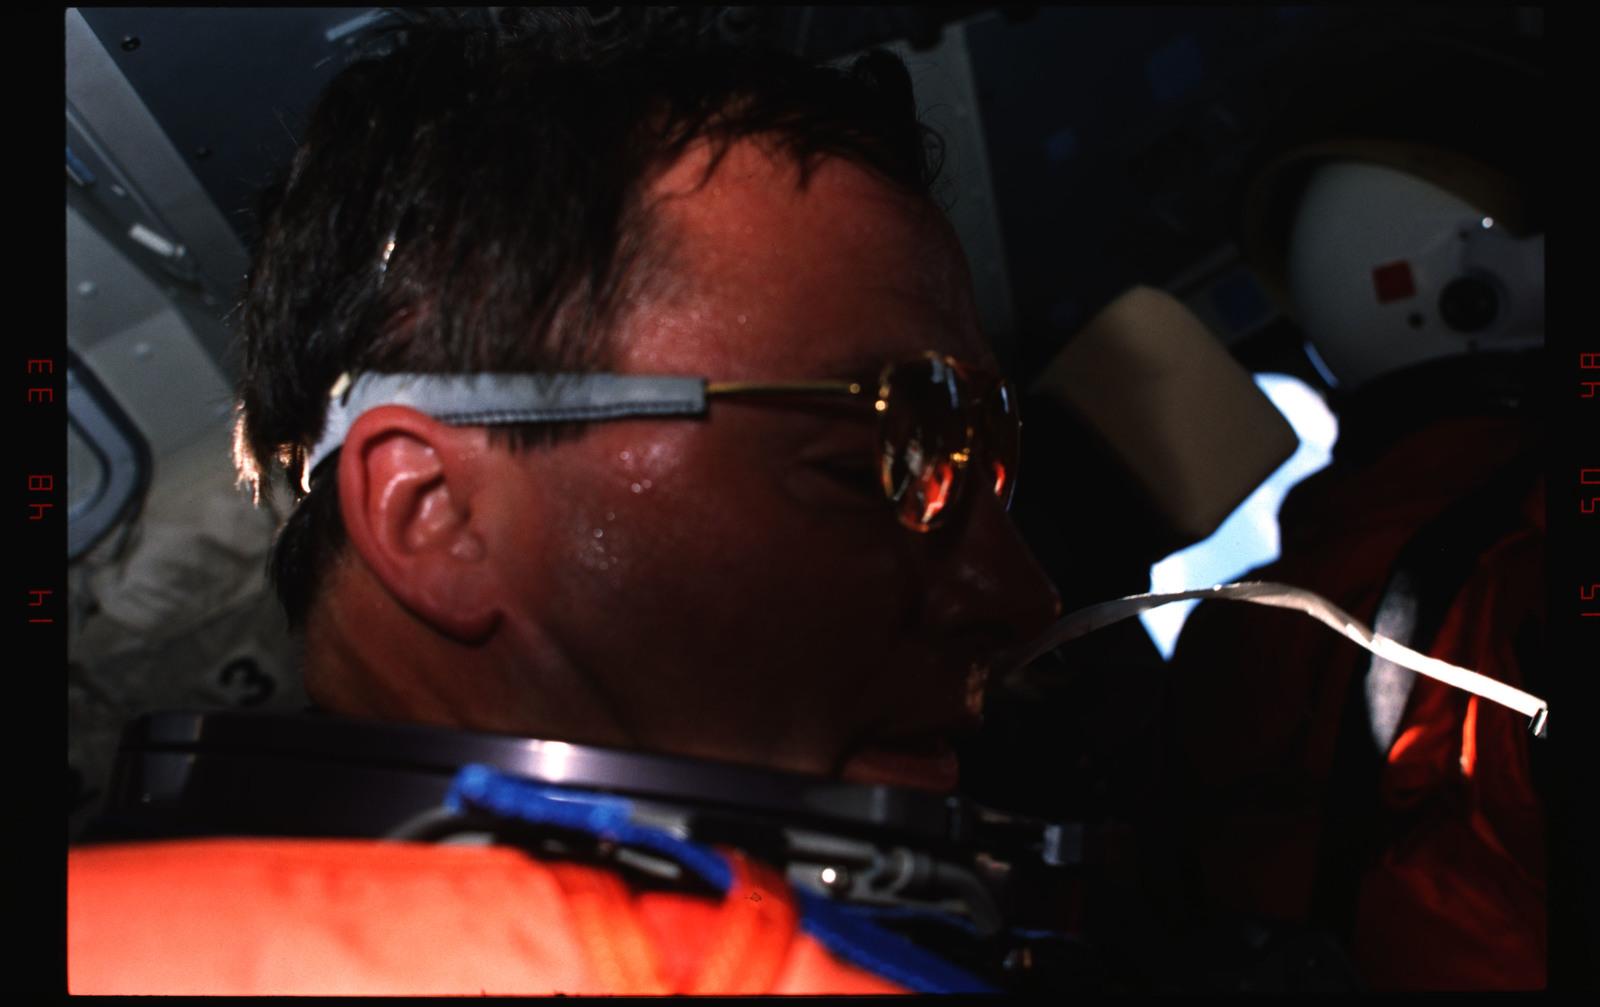 S37-02-007 - STS-037 - STS-37 crew activities